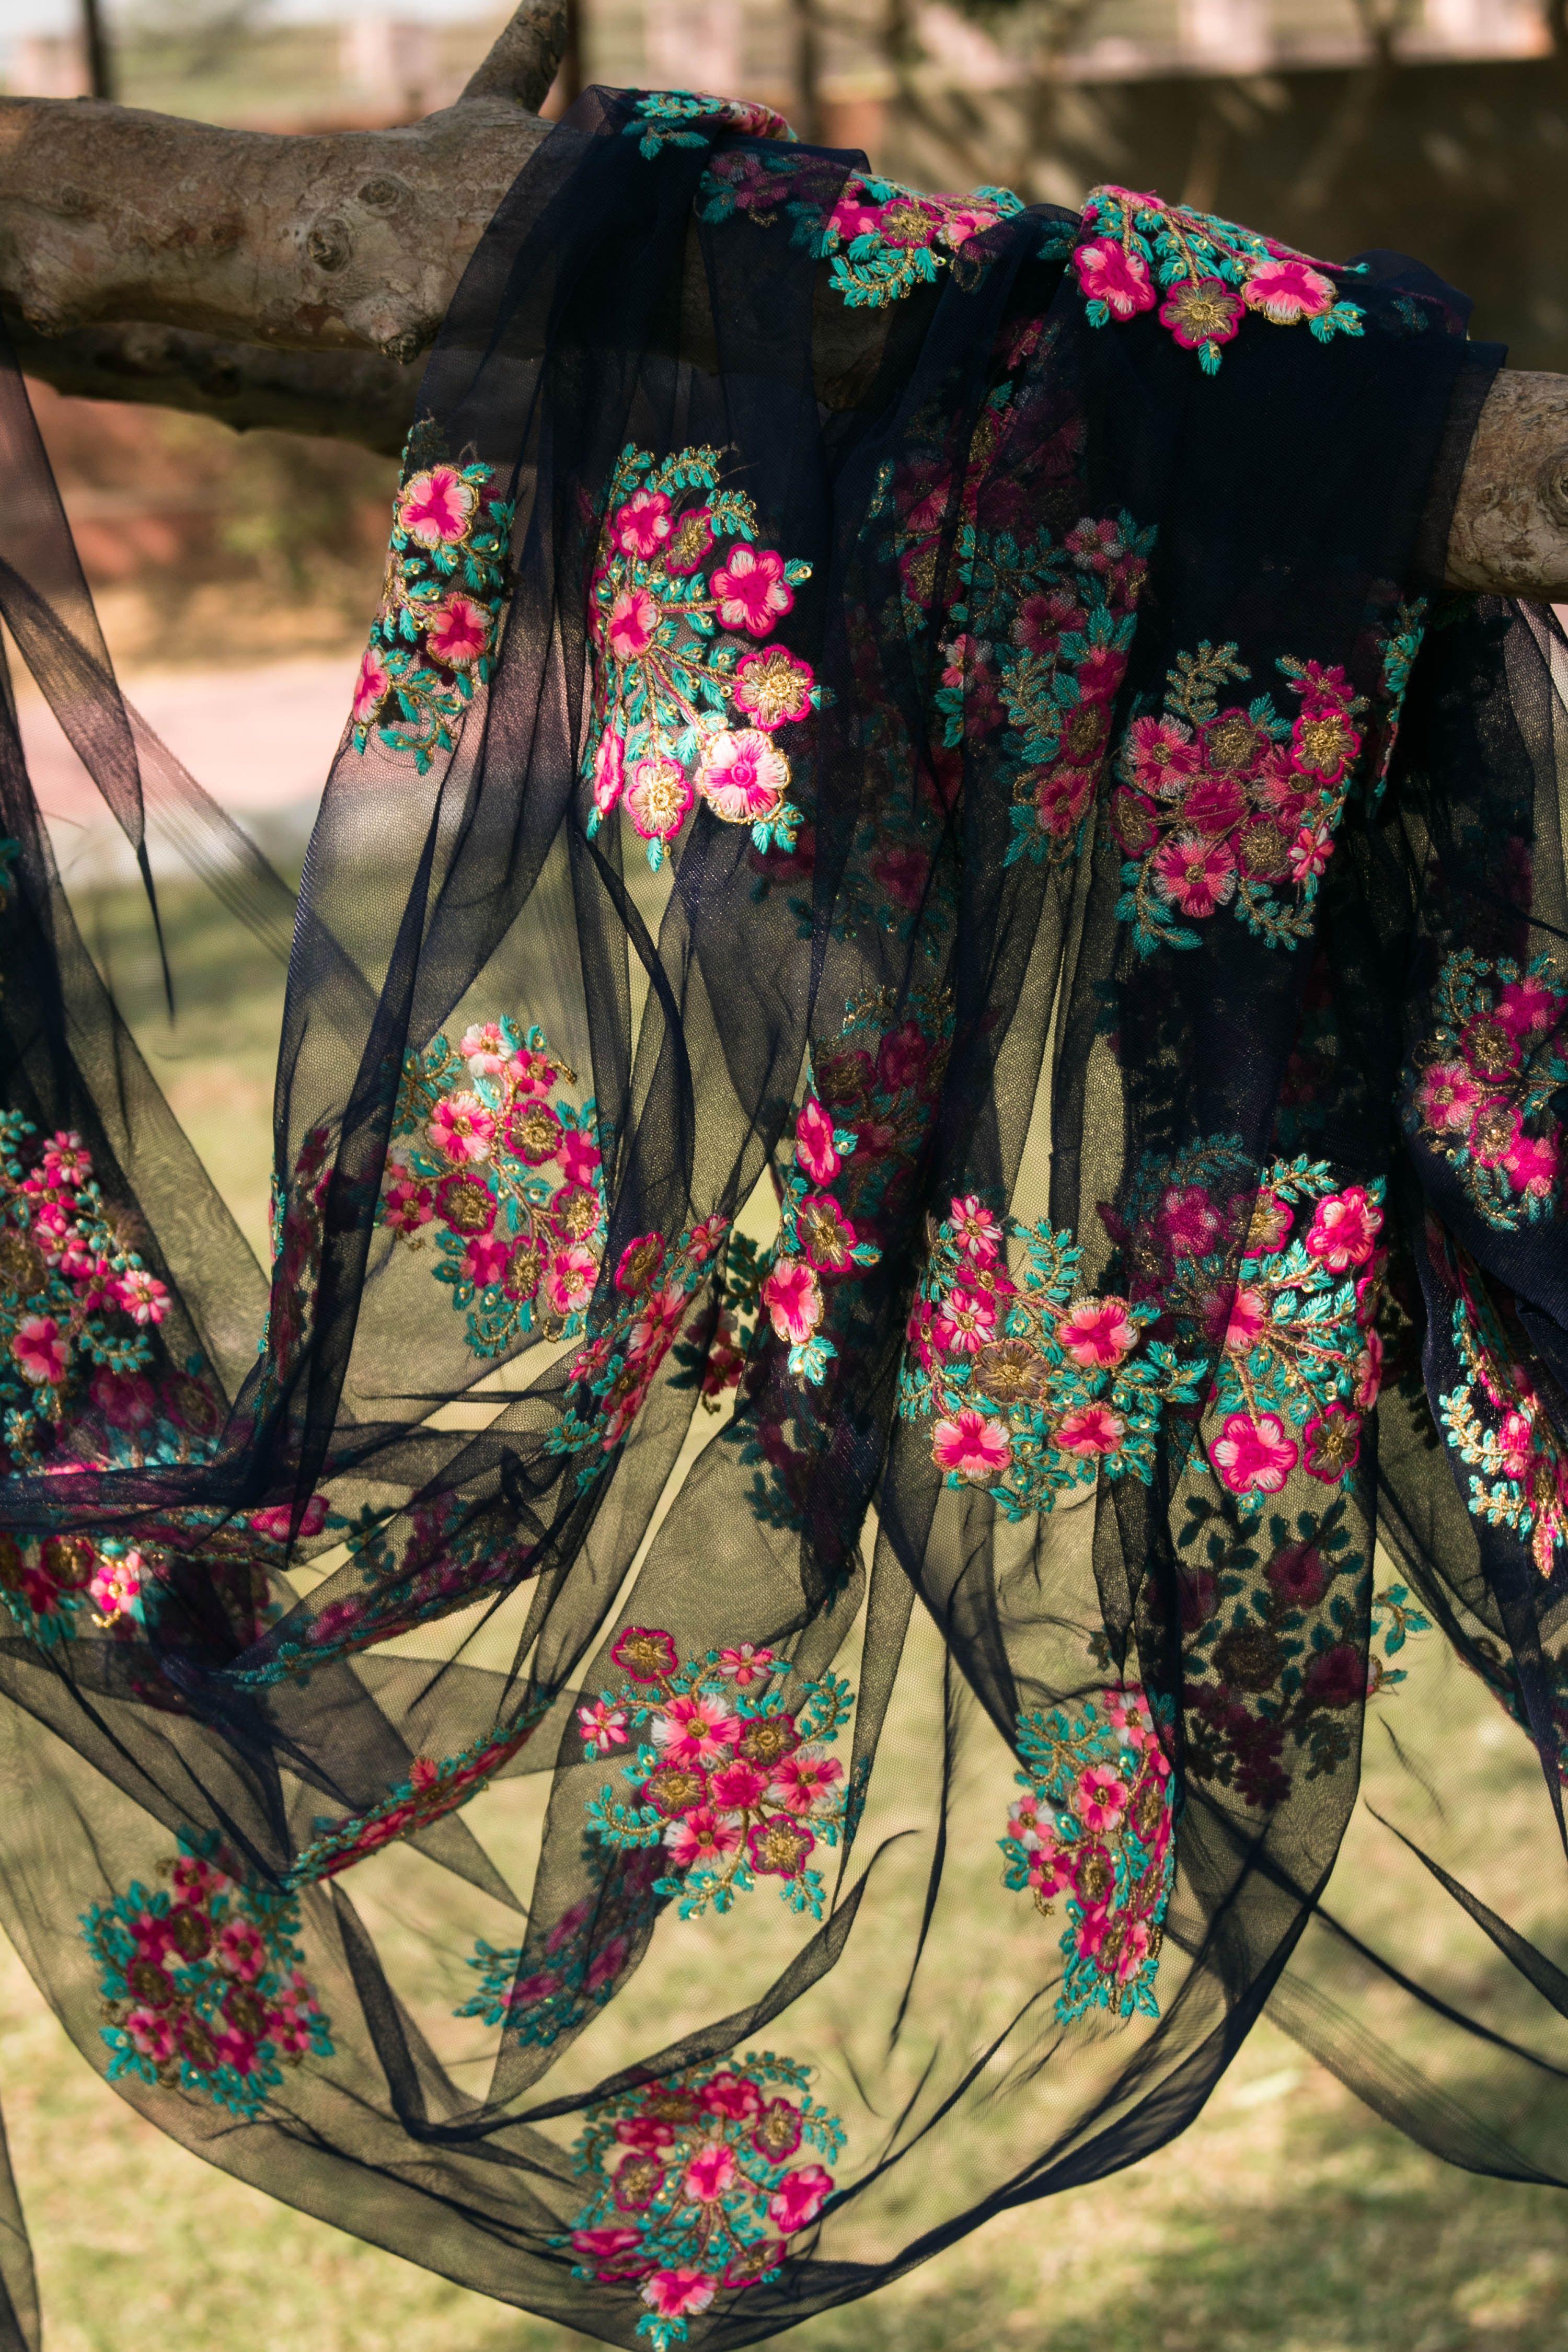 Where To Buy Embroidery Fabric : where, embroidery, fabric, Fabric, Online, Floral, Embroidery, Bridal, Fabric,, Saree